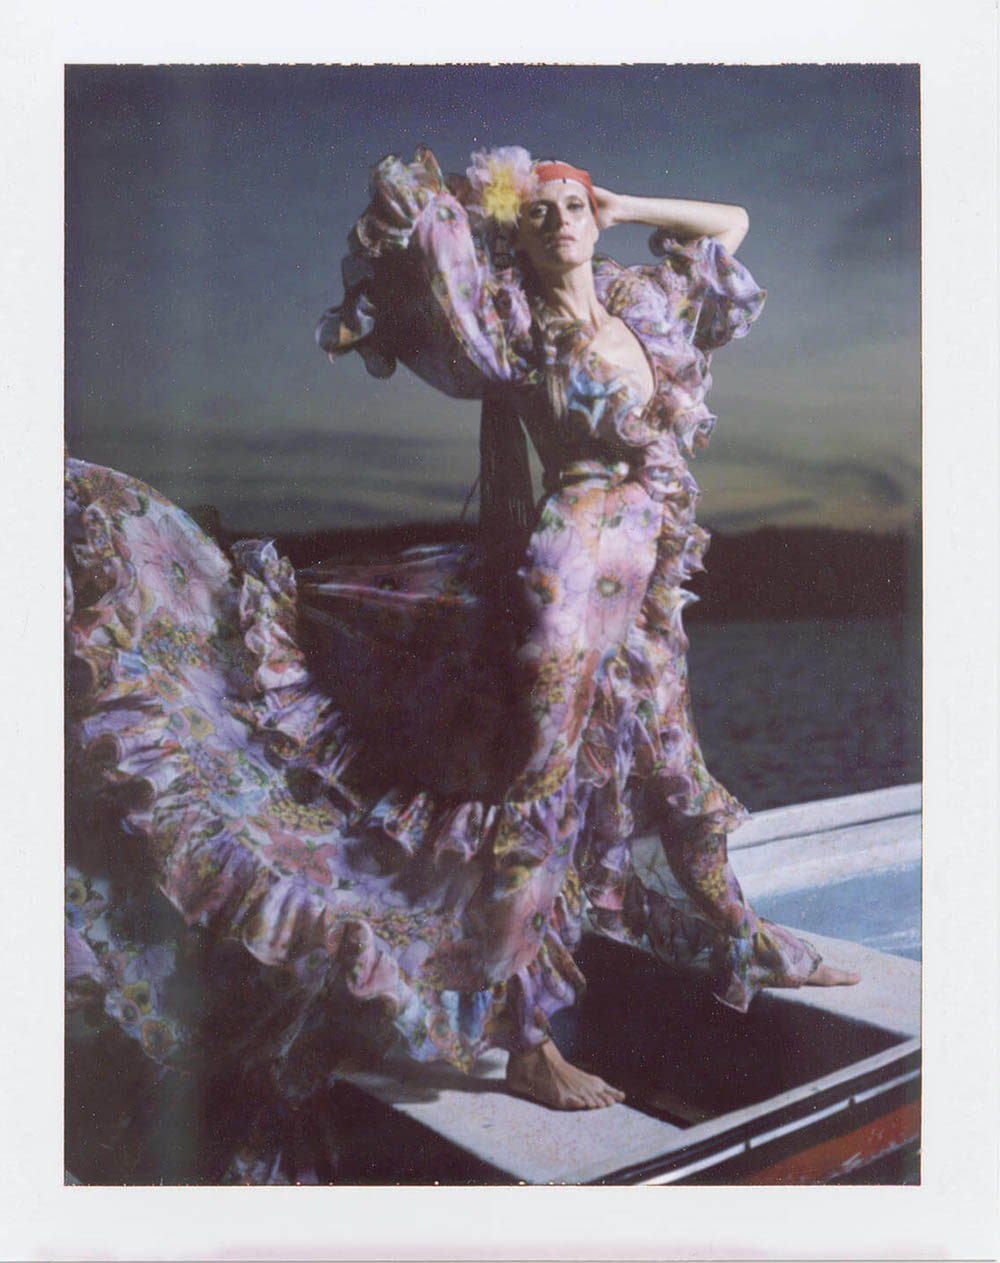 Małgosia Bela by Ethan James Green for WSJ. Magazine March 2020